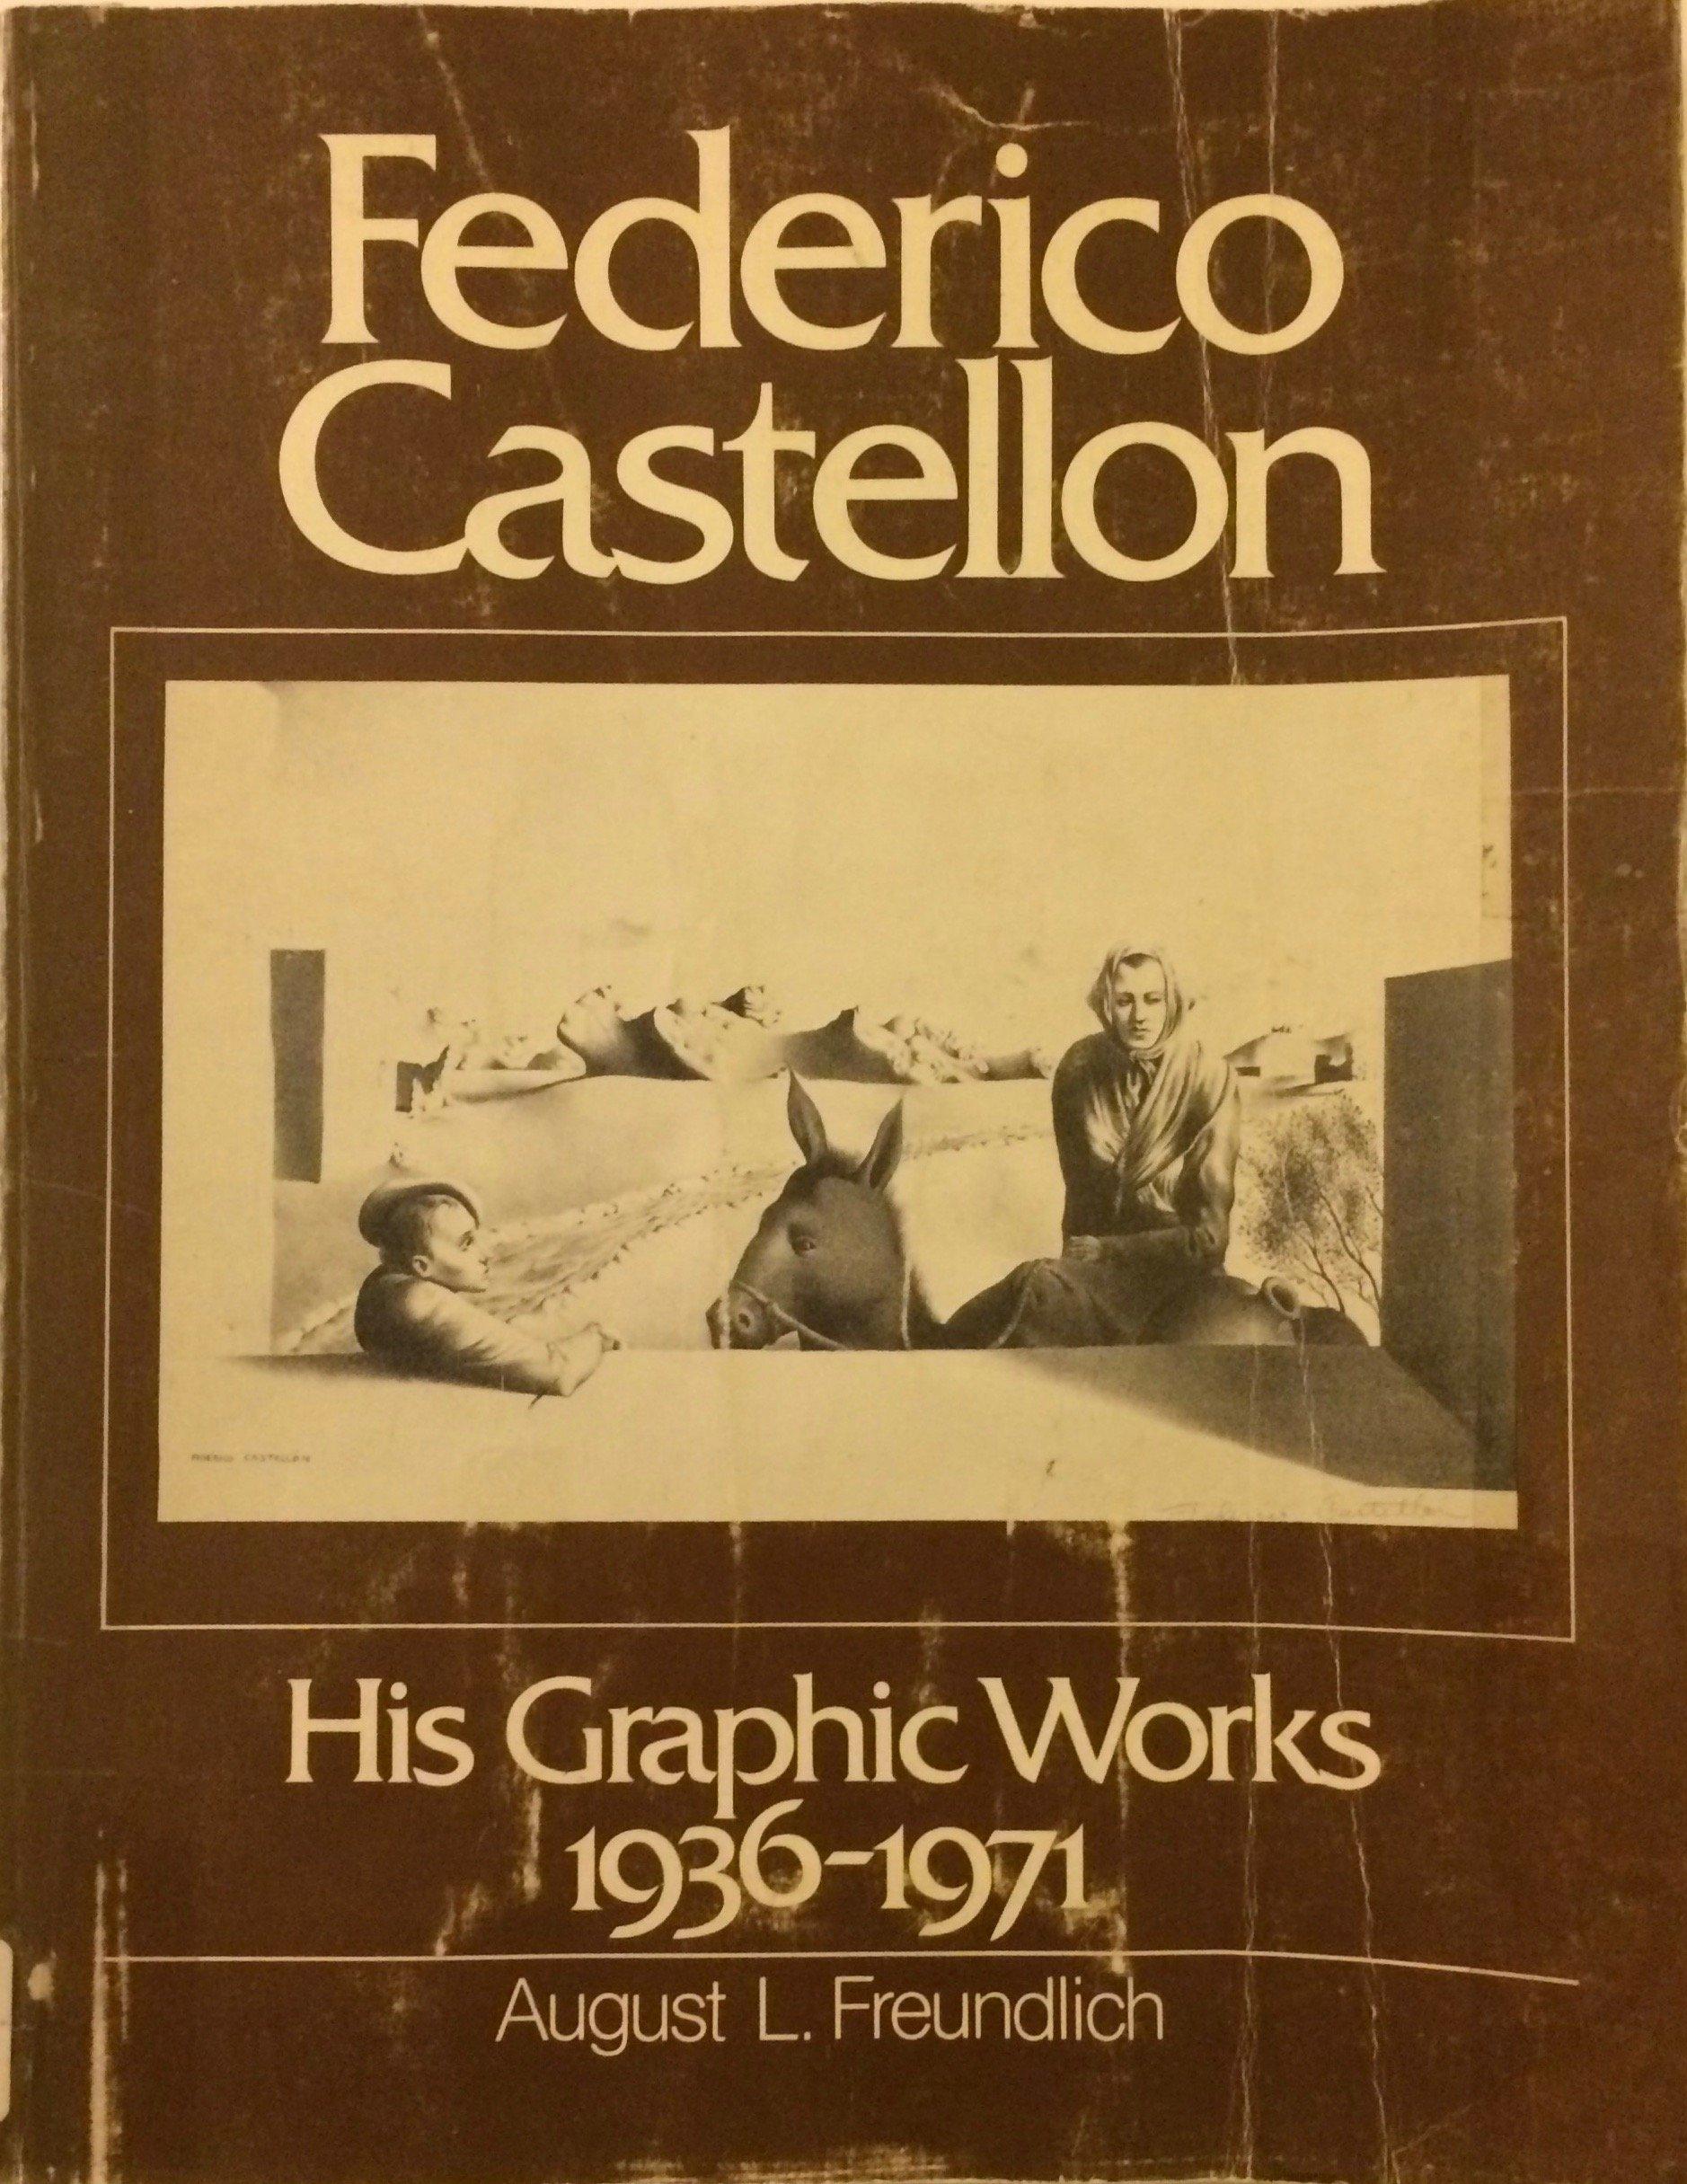 Amazon.com: Federico Castellon: His Graphic Works, 1936-1971 ...